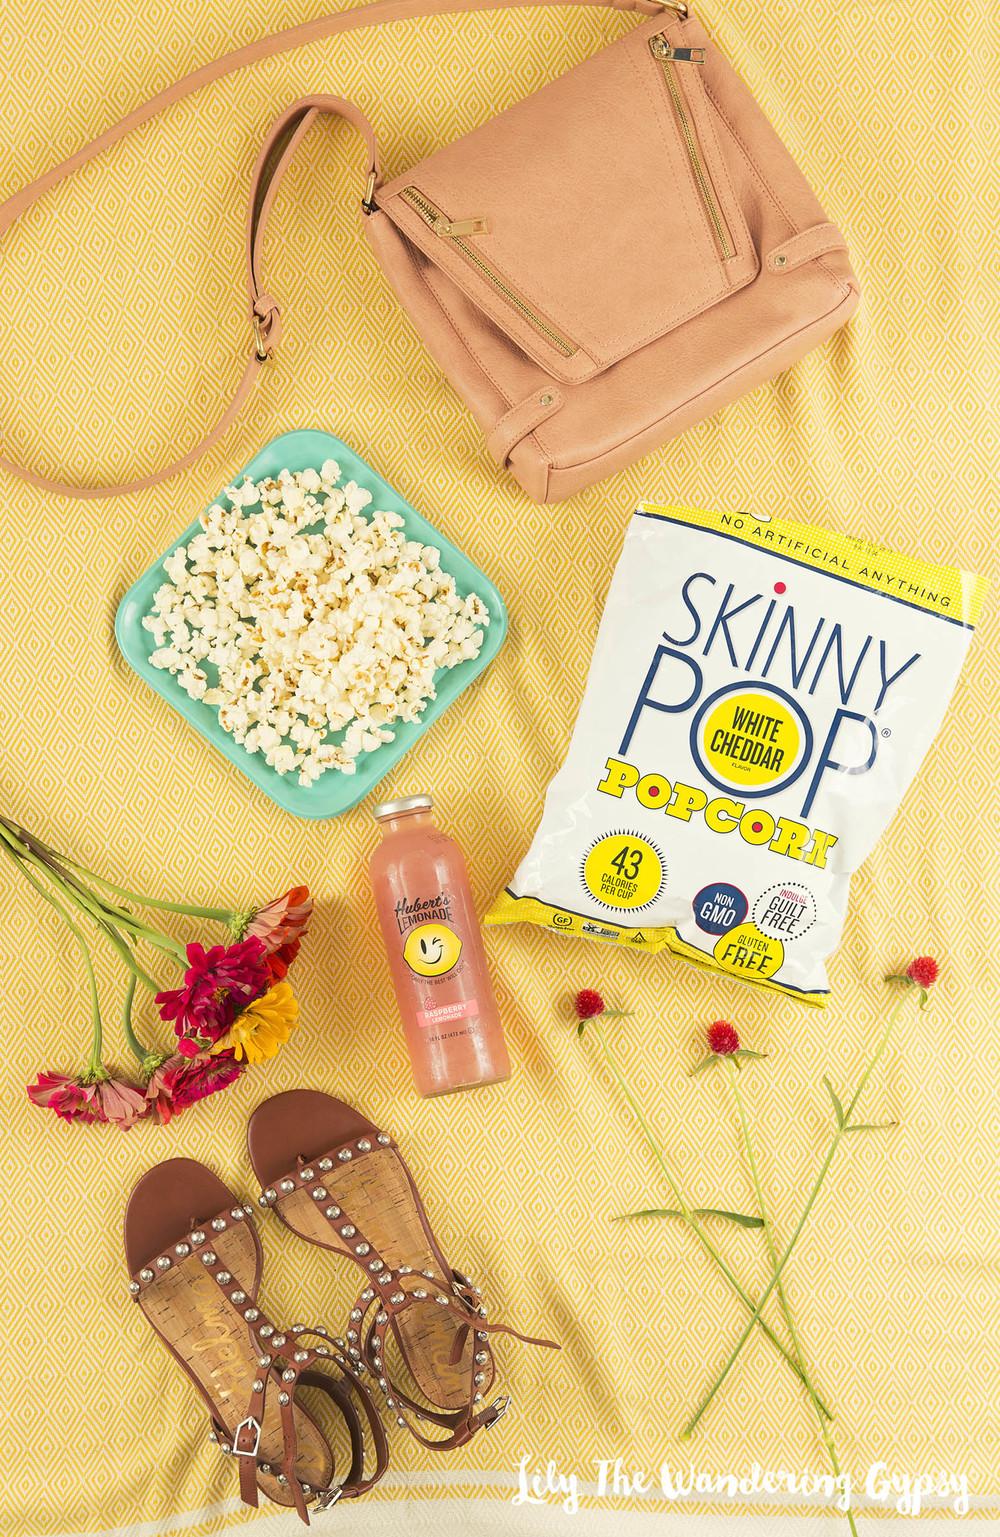 This popcorn is addicting!